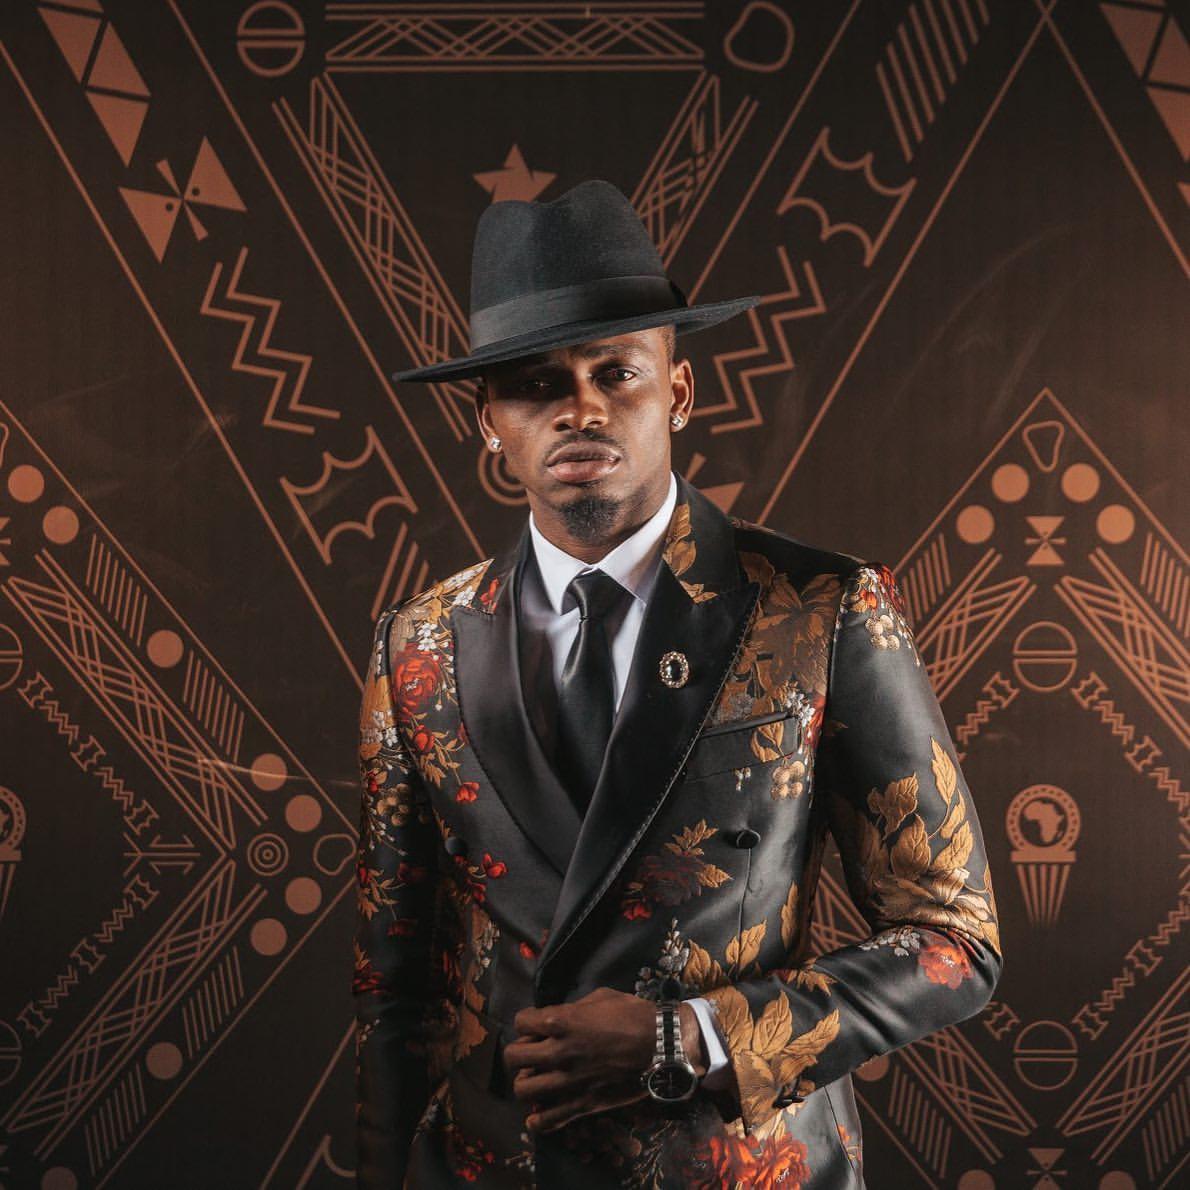 #DiamondPlatnumz #BABALAO #AfricanInfluencer #WCB4LIFE #Simba_wa_morogoro #SimbaWaMorogoro Cc @diamondplatnumzpic.twitter.com/O133yhQIjb